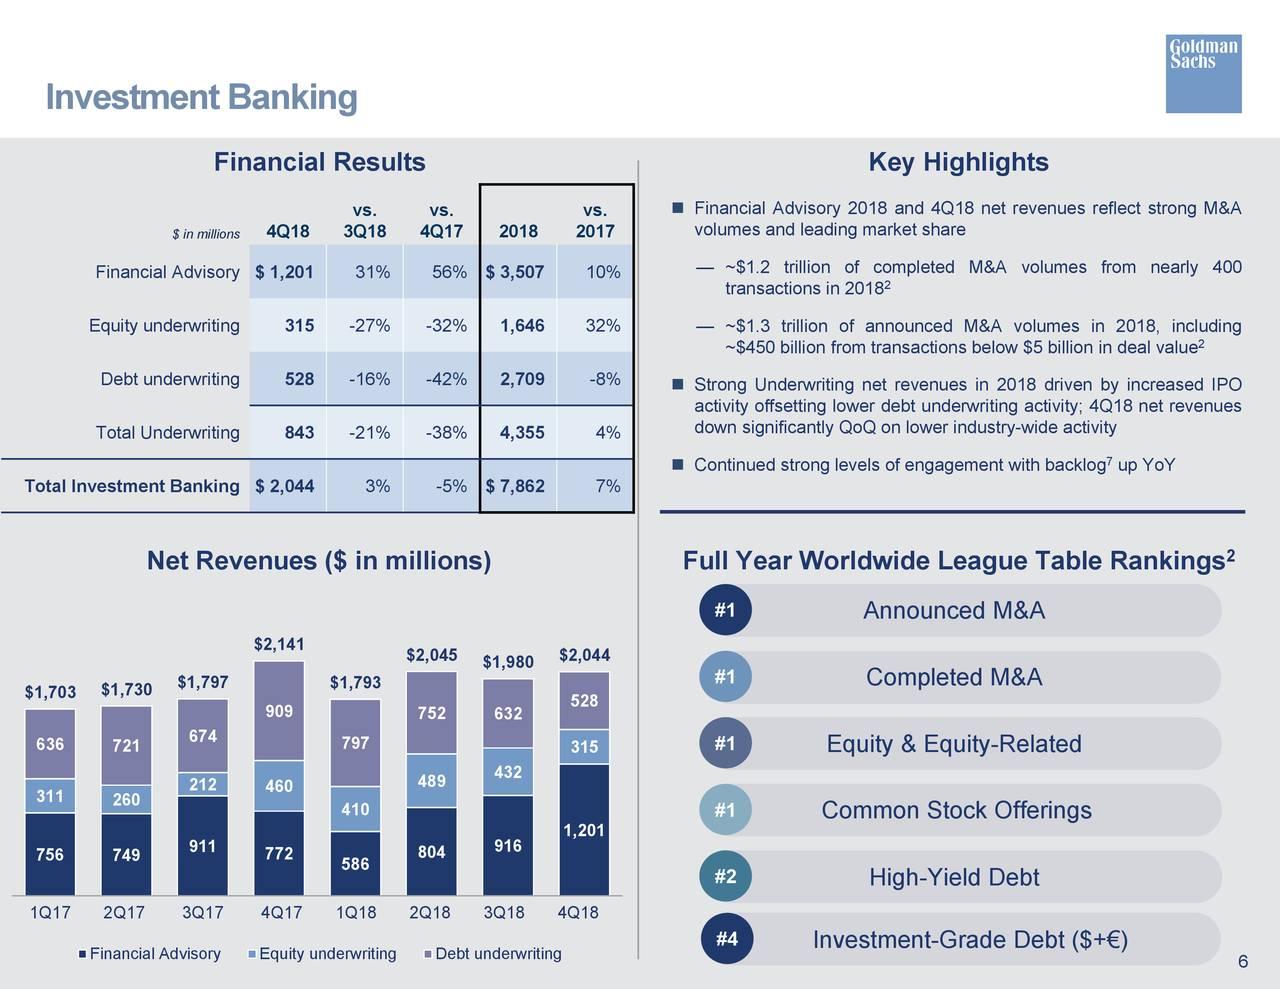 Earnings Disclaimer >> Goldman Sachs Group Inc. 2018 Q4 - Results - Earnings Call Slides - The Goldman Sachs Group, Inc ...